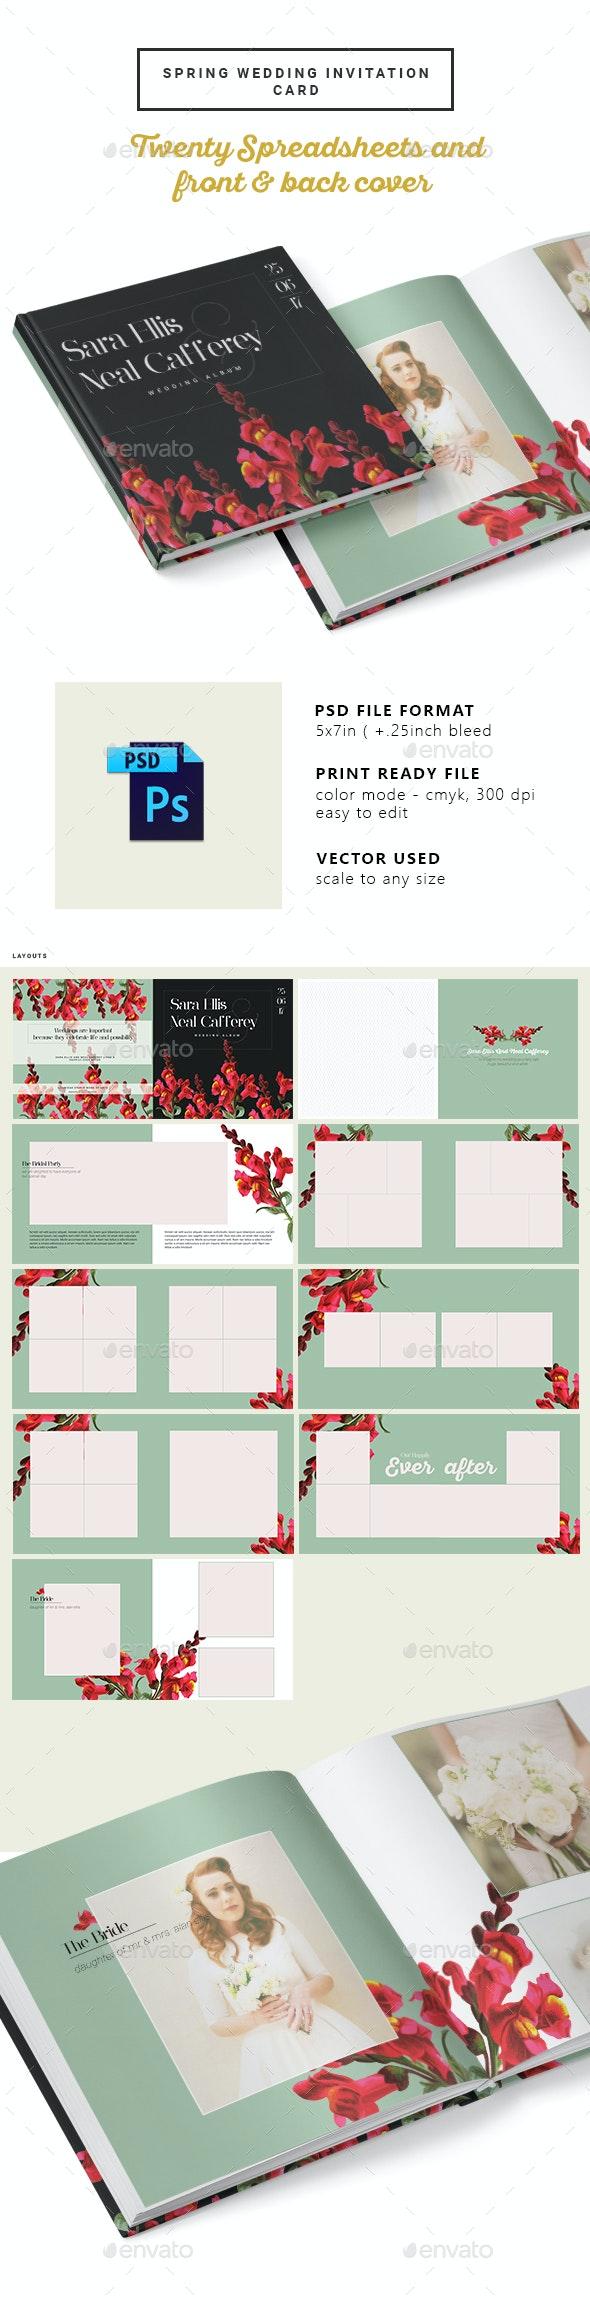 Vintage Floral Wedding Photobook/Album - Photo Albums Print Templates